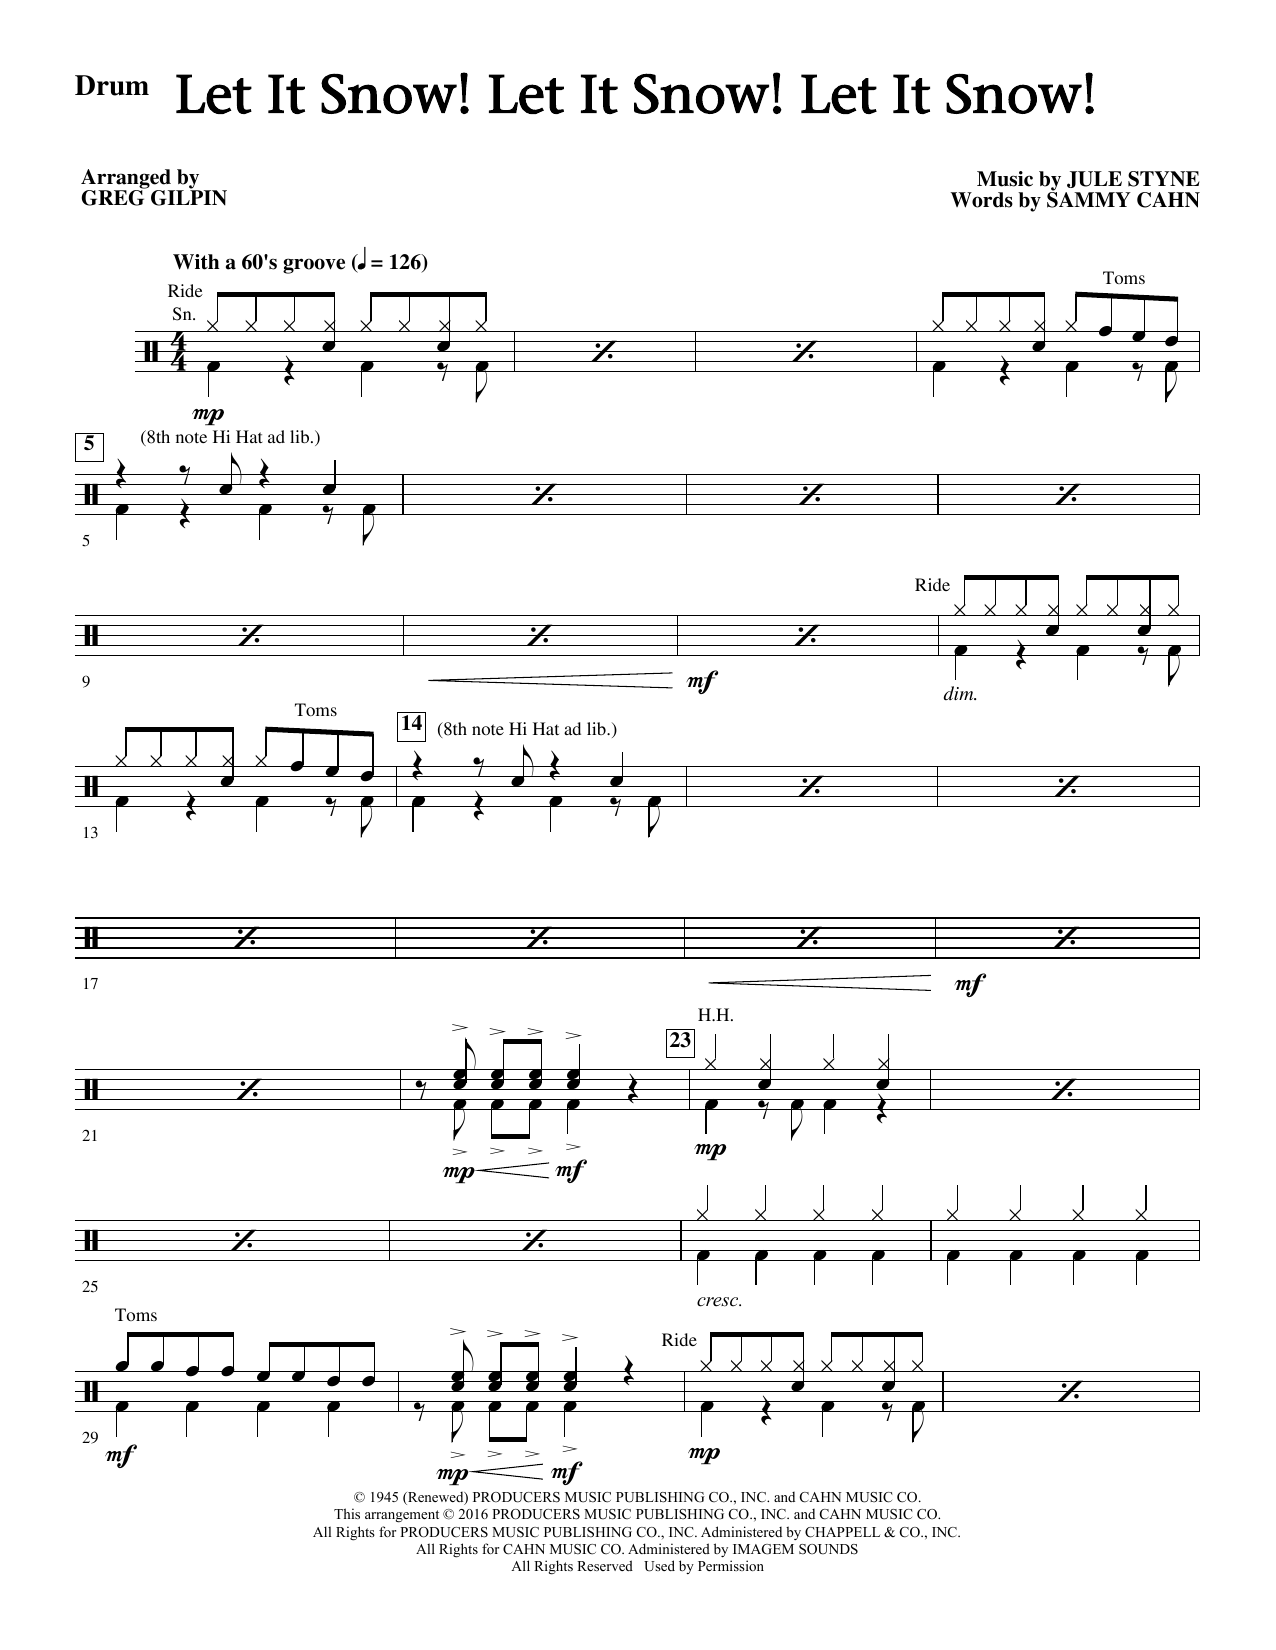 Let It Snow! Let It Snow! Let It Snow! - Drums Sheet Music